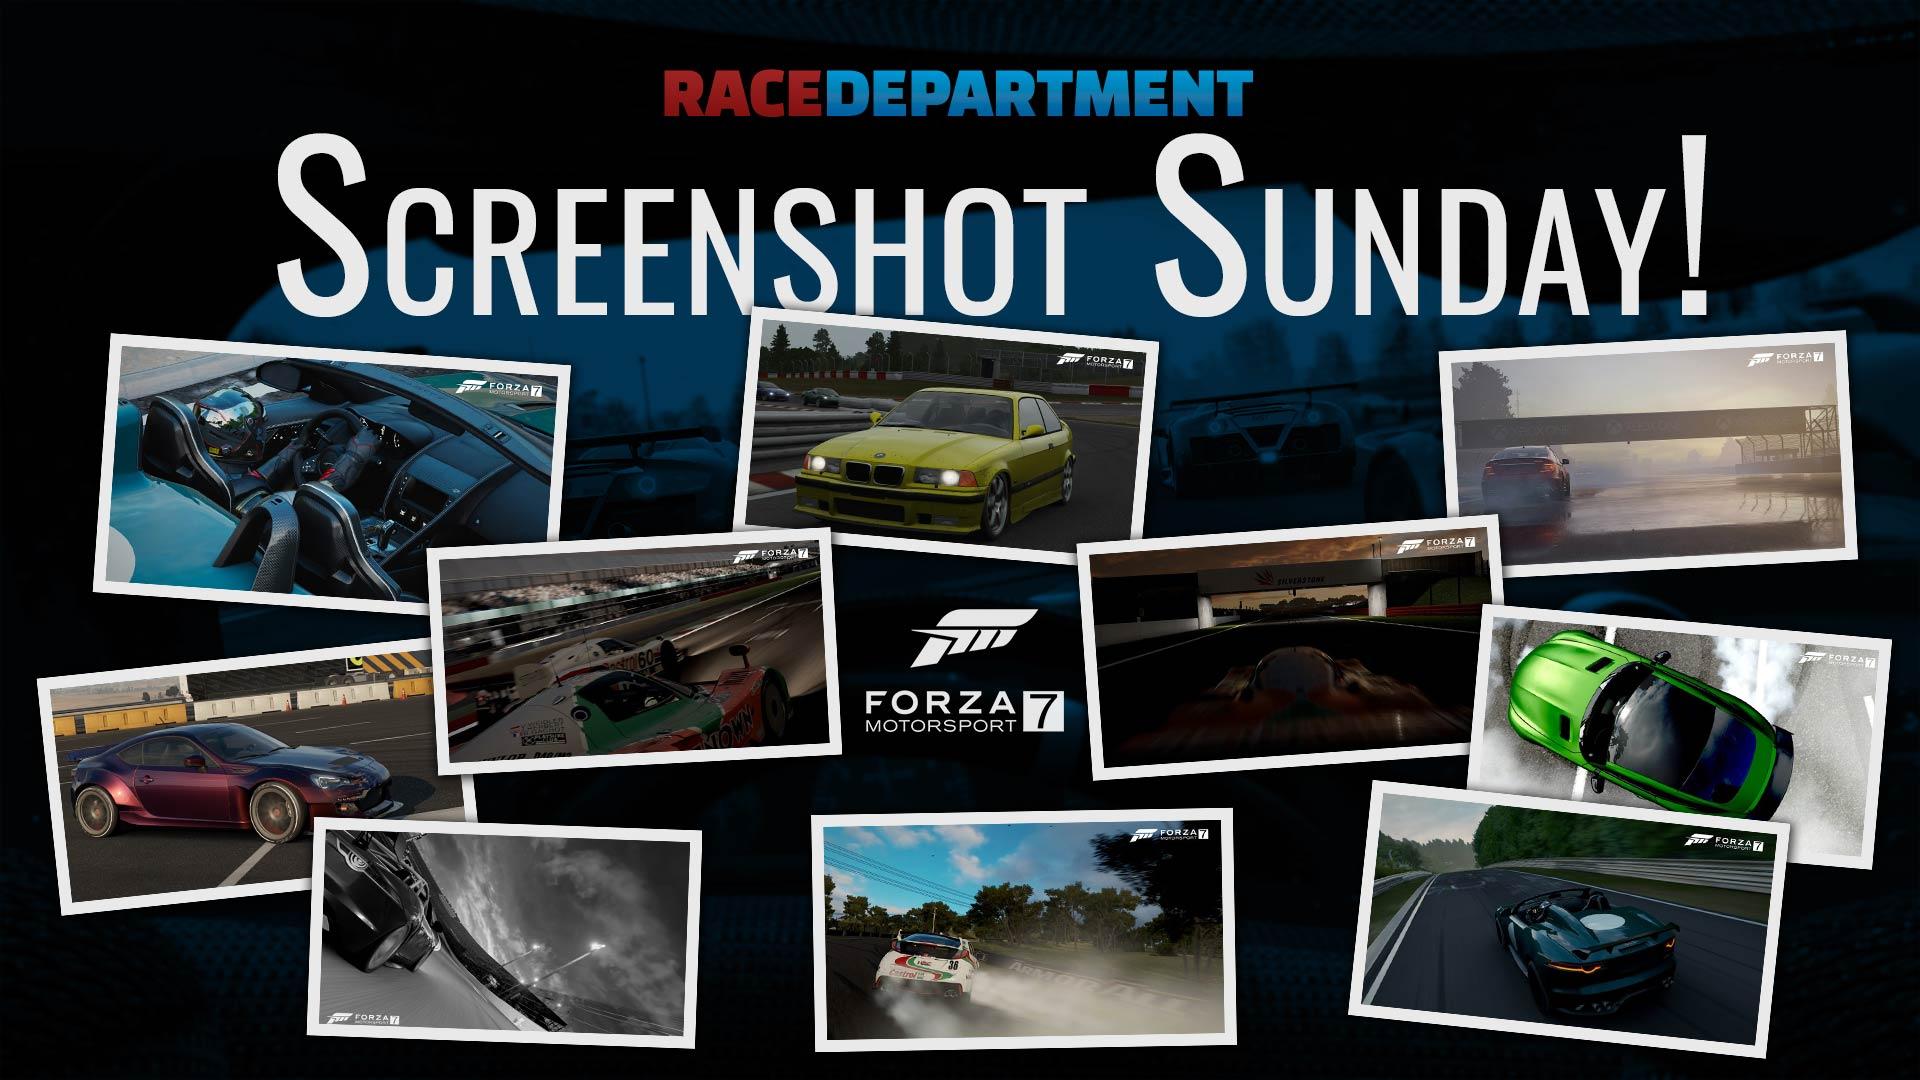 Screenshot Sunday - Forza Motorsport 7 Edition.jpg